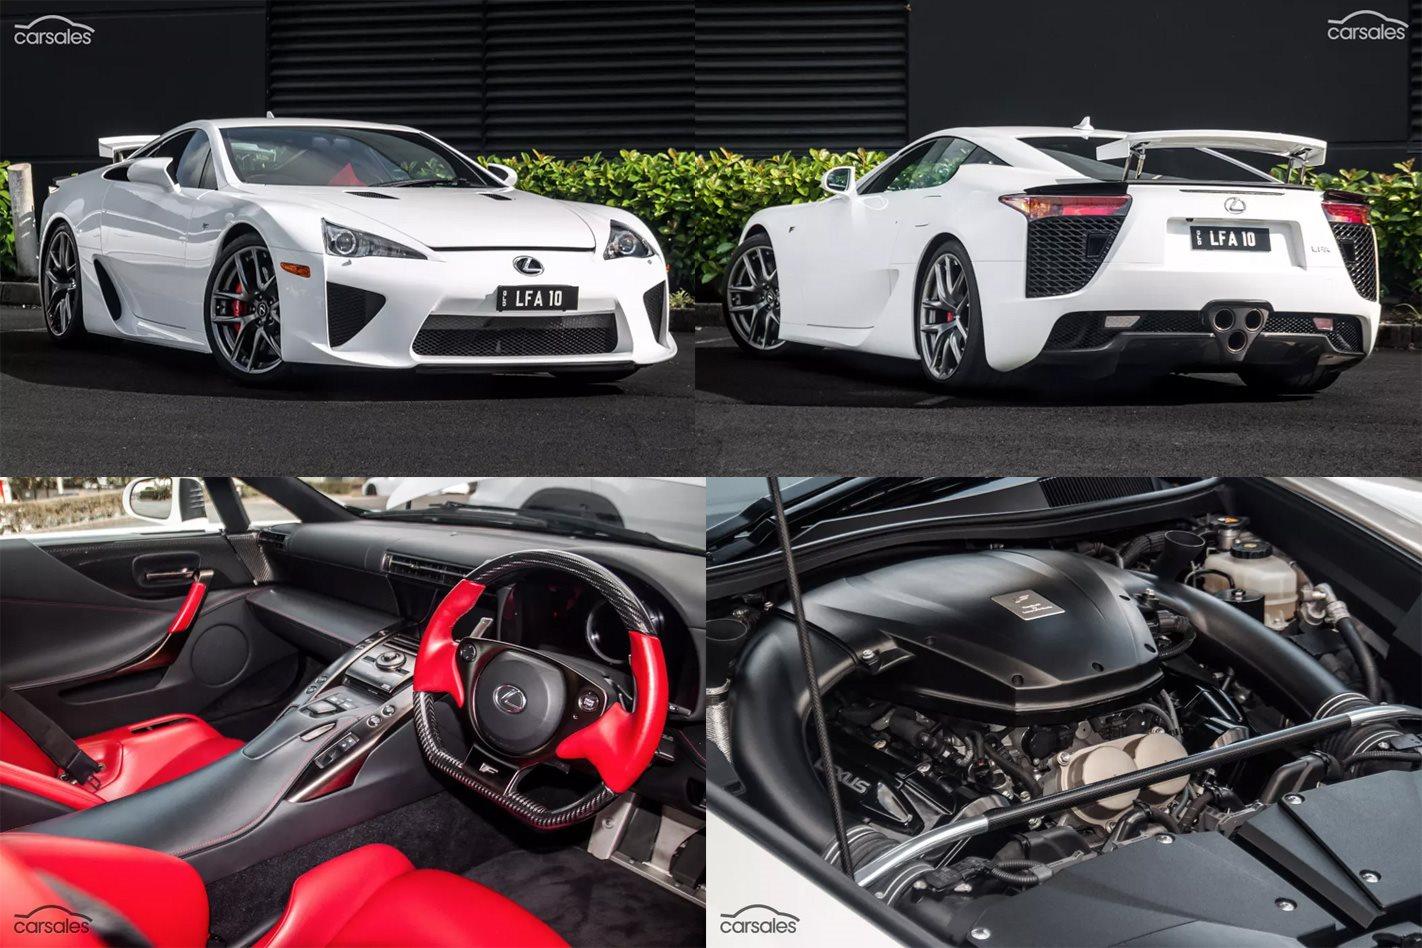 Lexus Lfa For Sale >> Lexus LFA for sale in Australia with $1m+ price tag